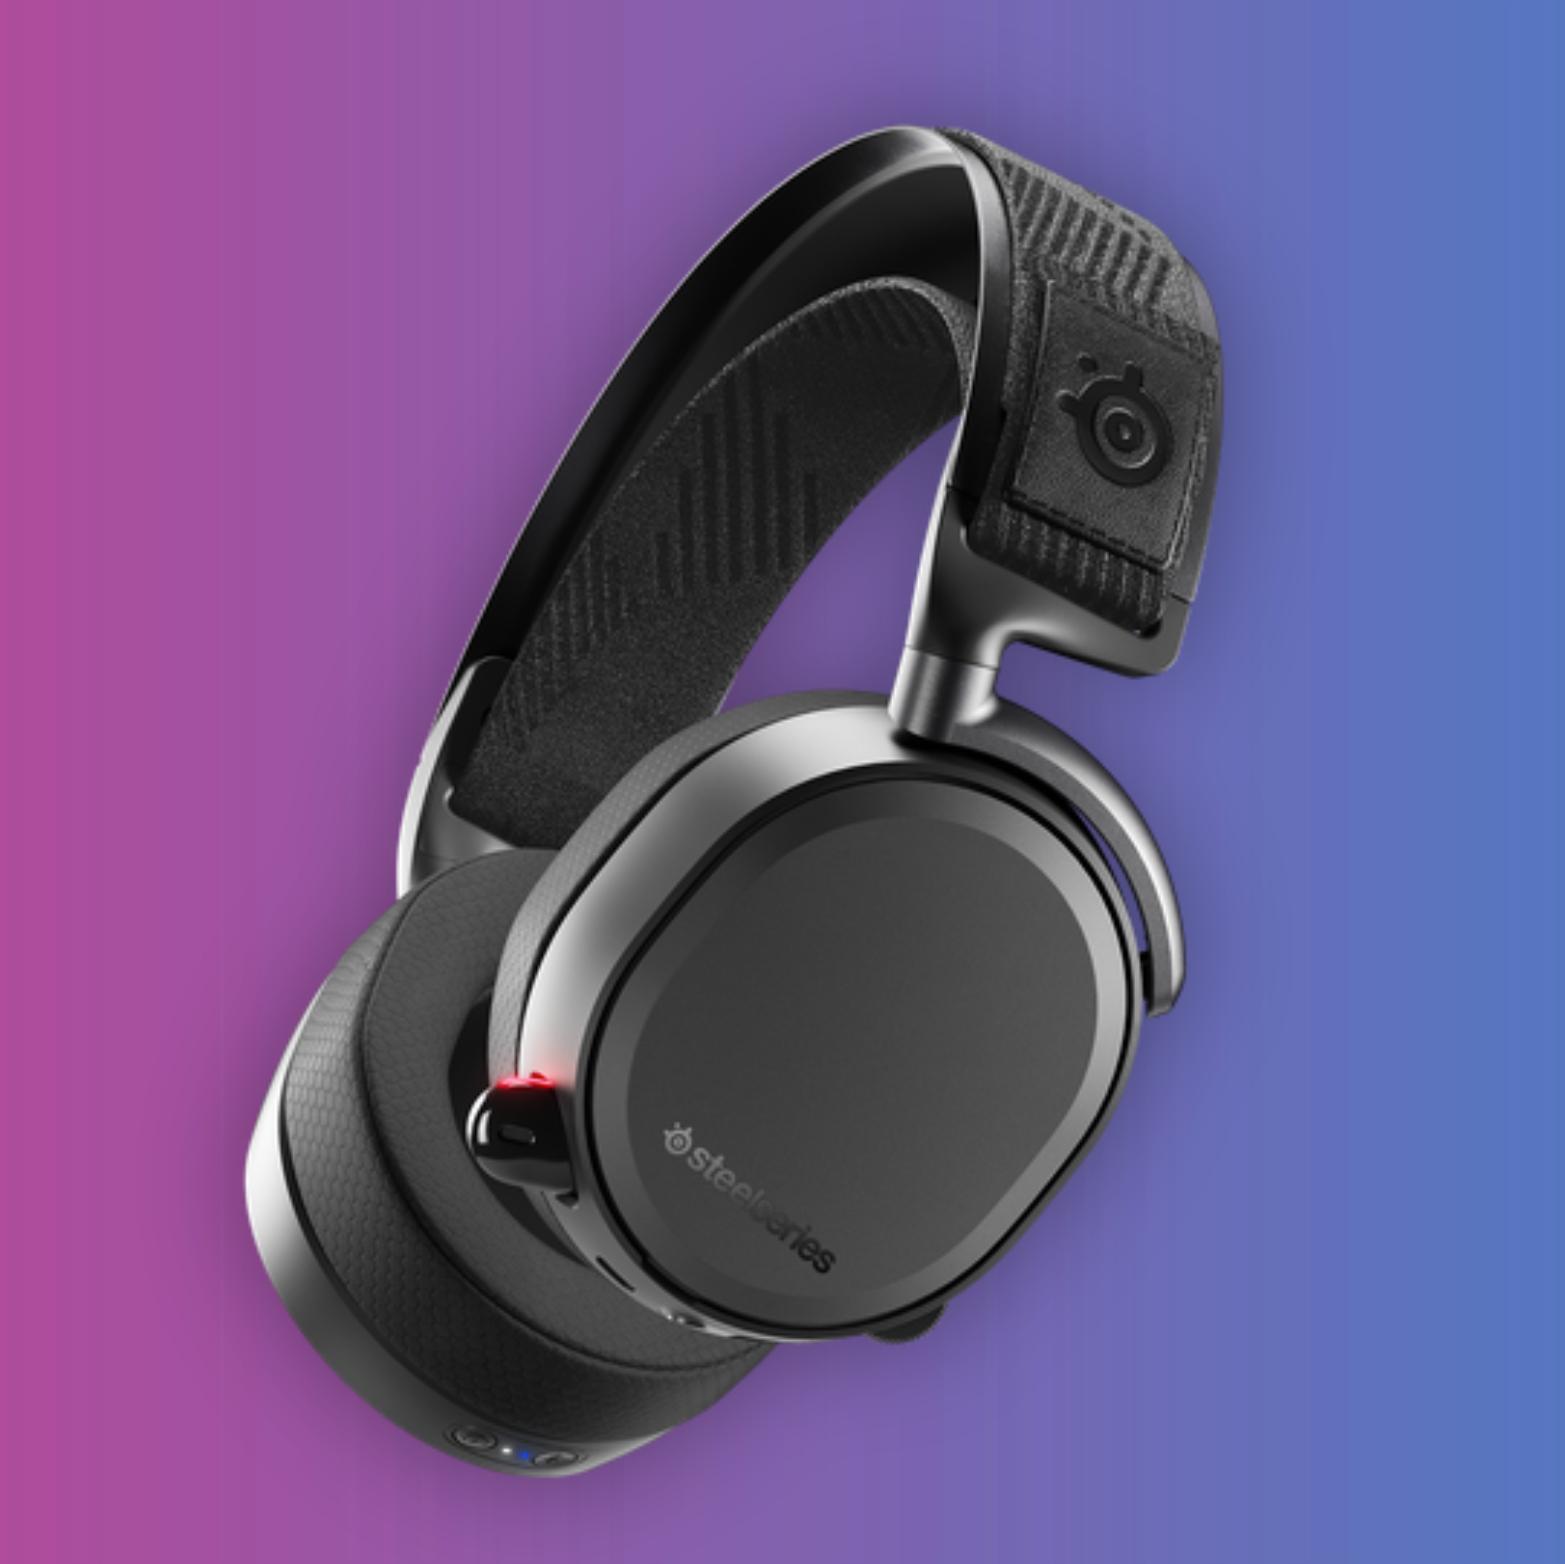 Steelseries Arctis Pro Wireless: Kabelloses Gaming-Headset (WiFi, Bluetooth, 20h Akku, 40mm Treiber)